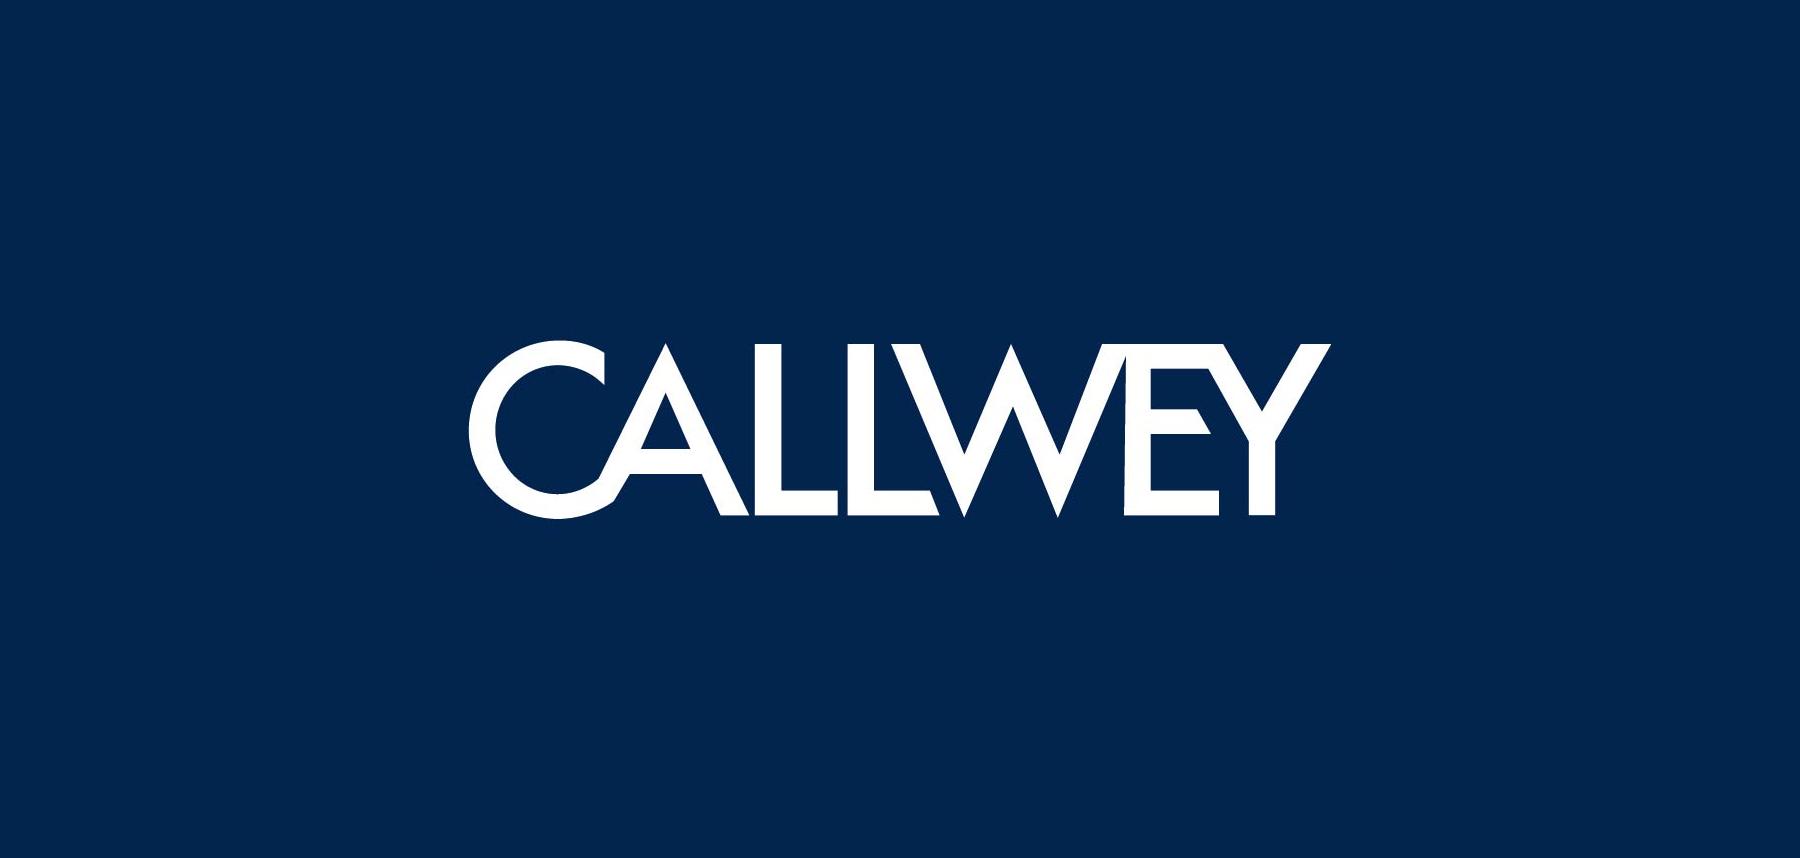 callwey blog